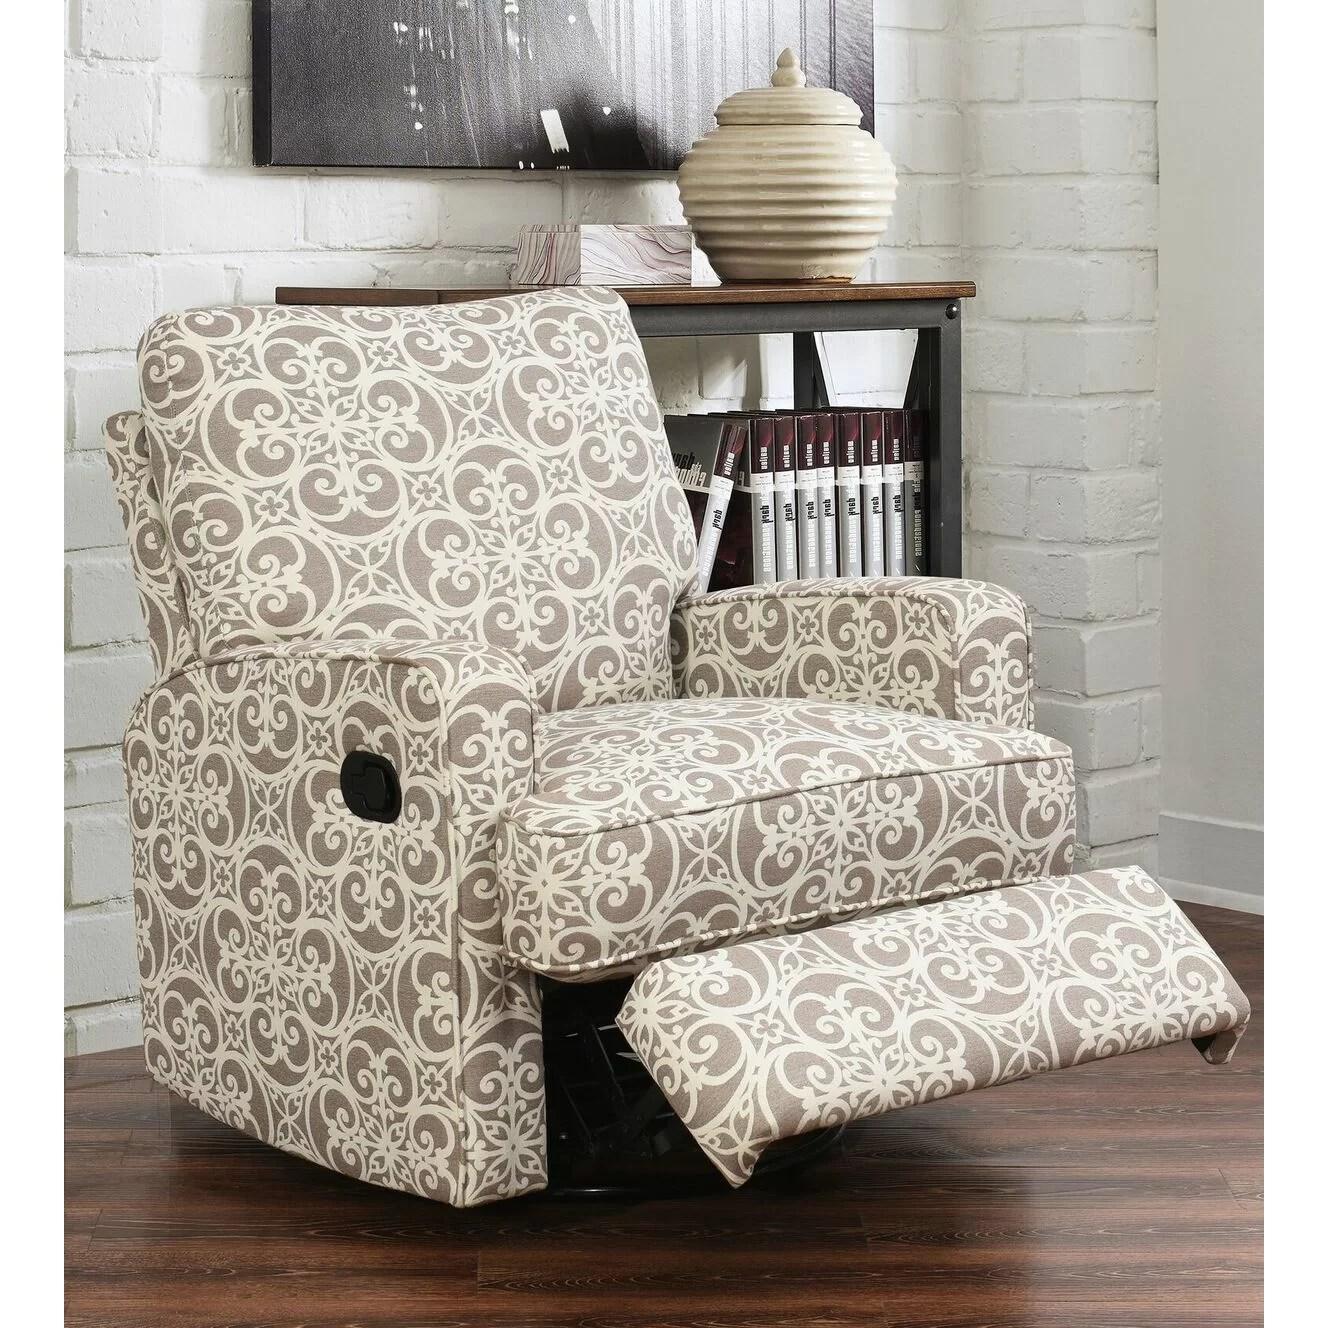 Where Buy Patio Furniture Near Me